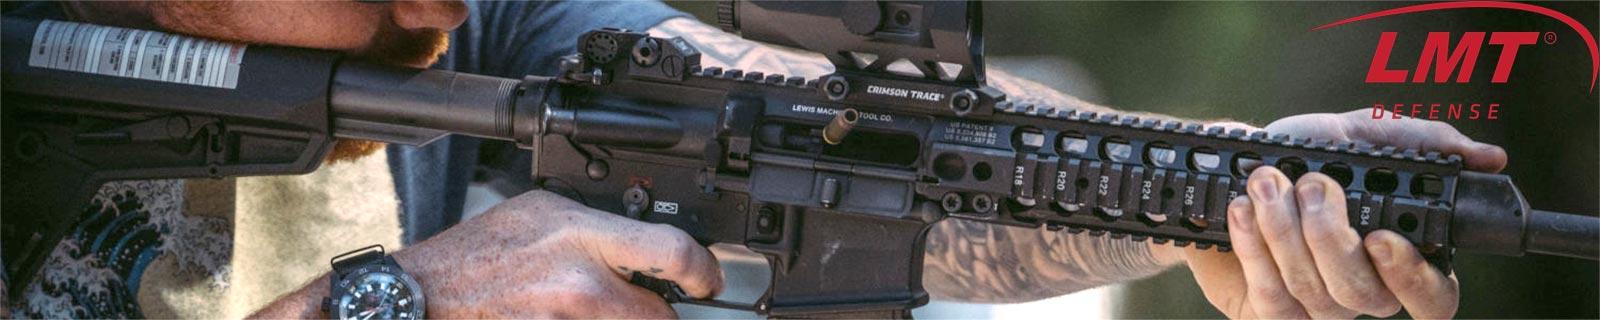 Shop for LMT Rifles and Gear at TexasStarArsenal.com